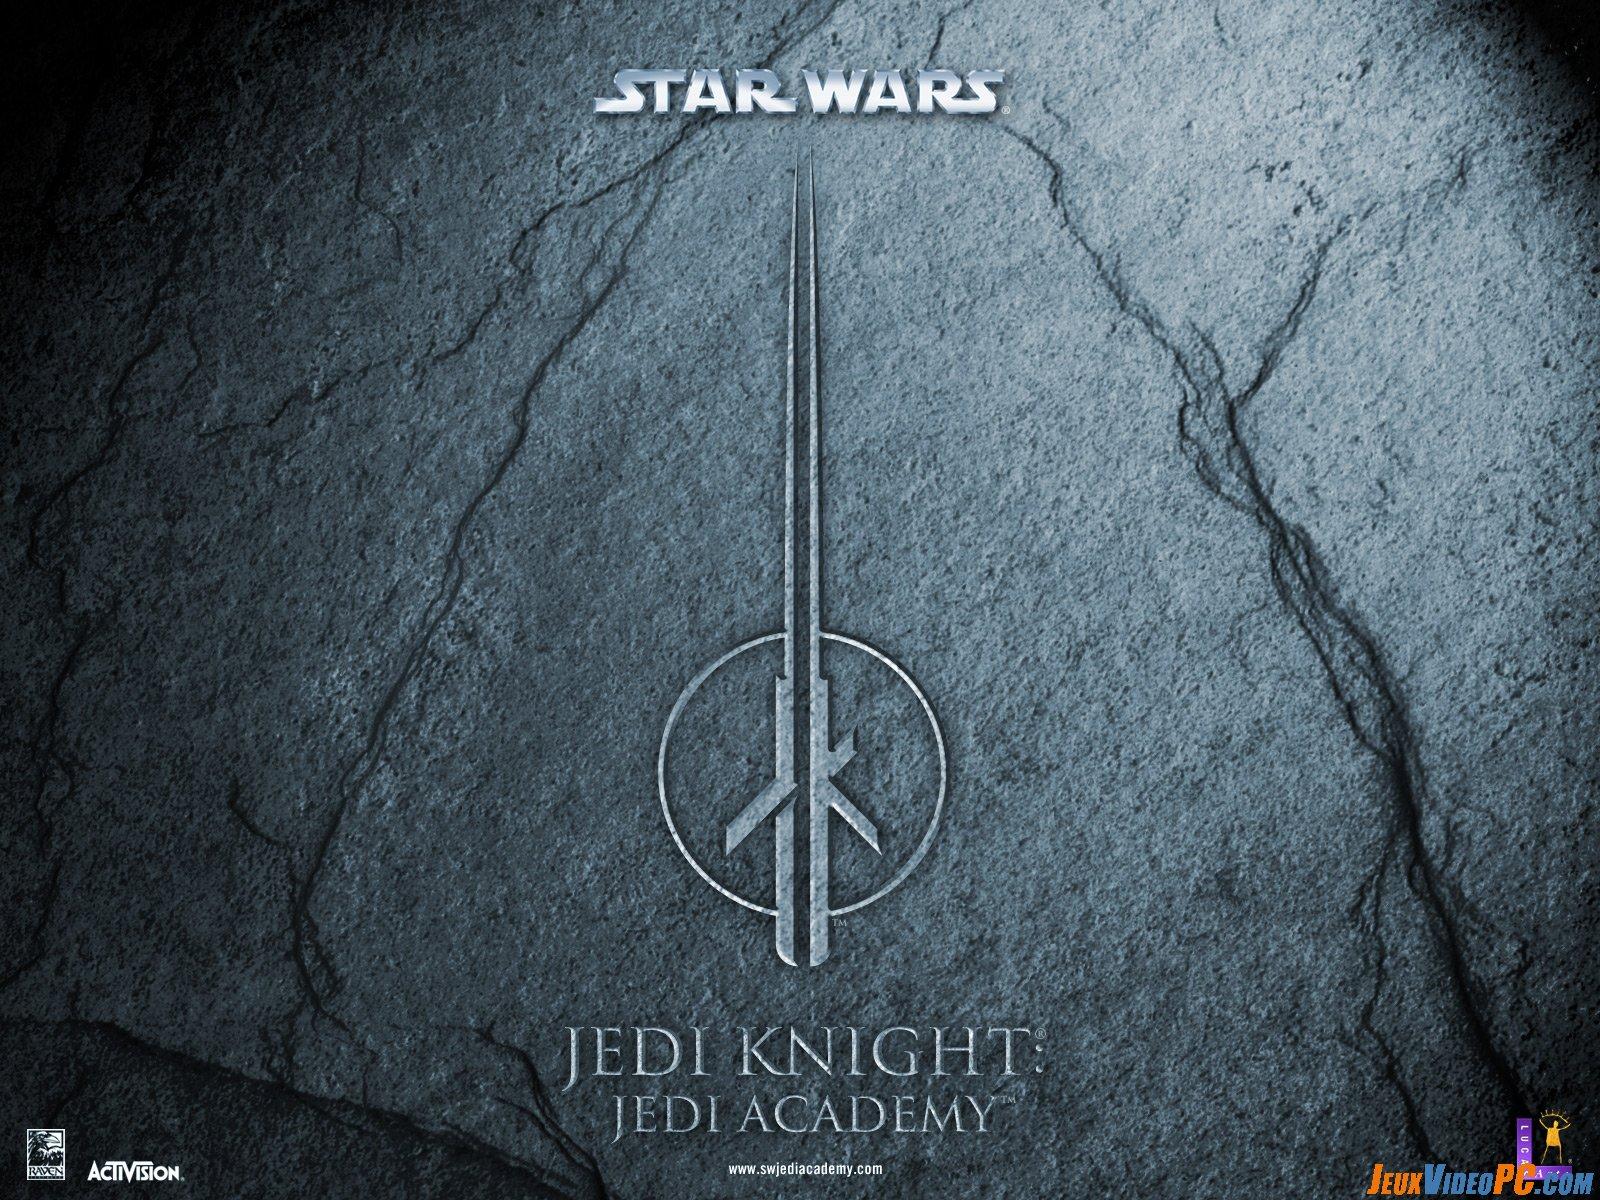 Jedi Knight 3 Jedi Academy Wallpaper Image Le Fancy Wallpapers Mod Db